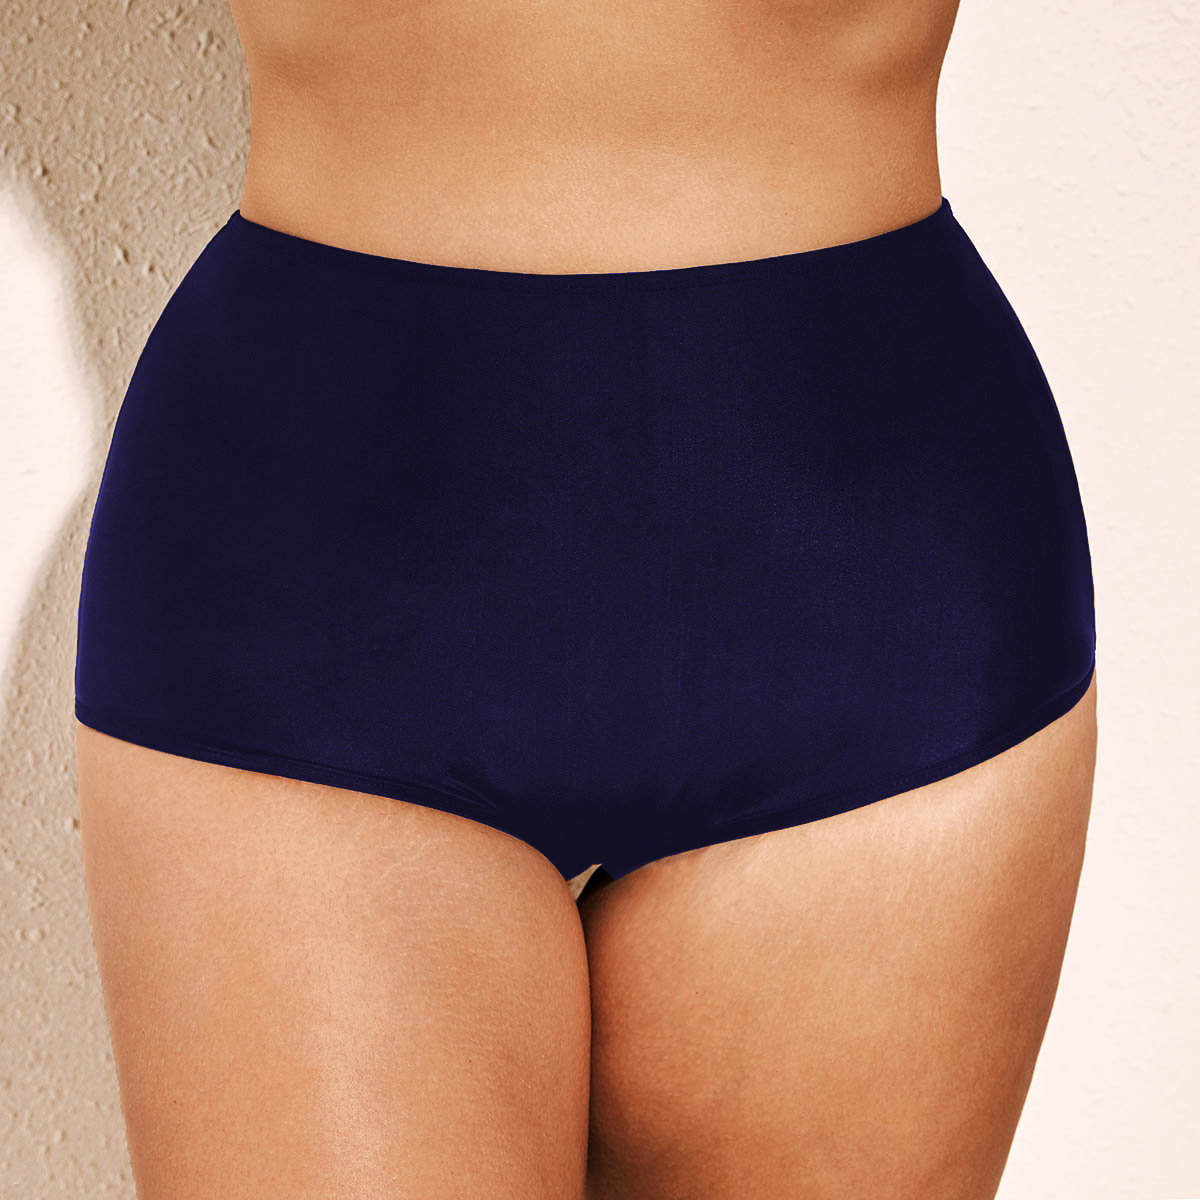 Navy Blue Plus Size High Waist Swimwear Panty